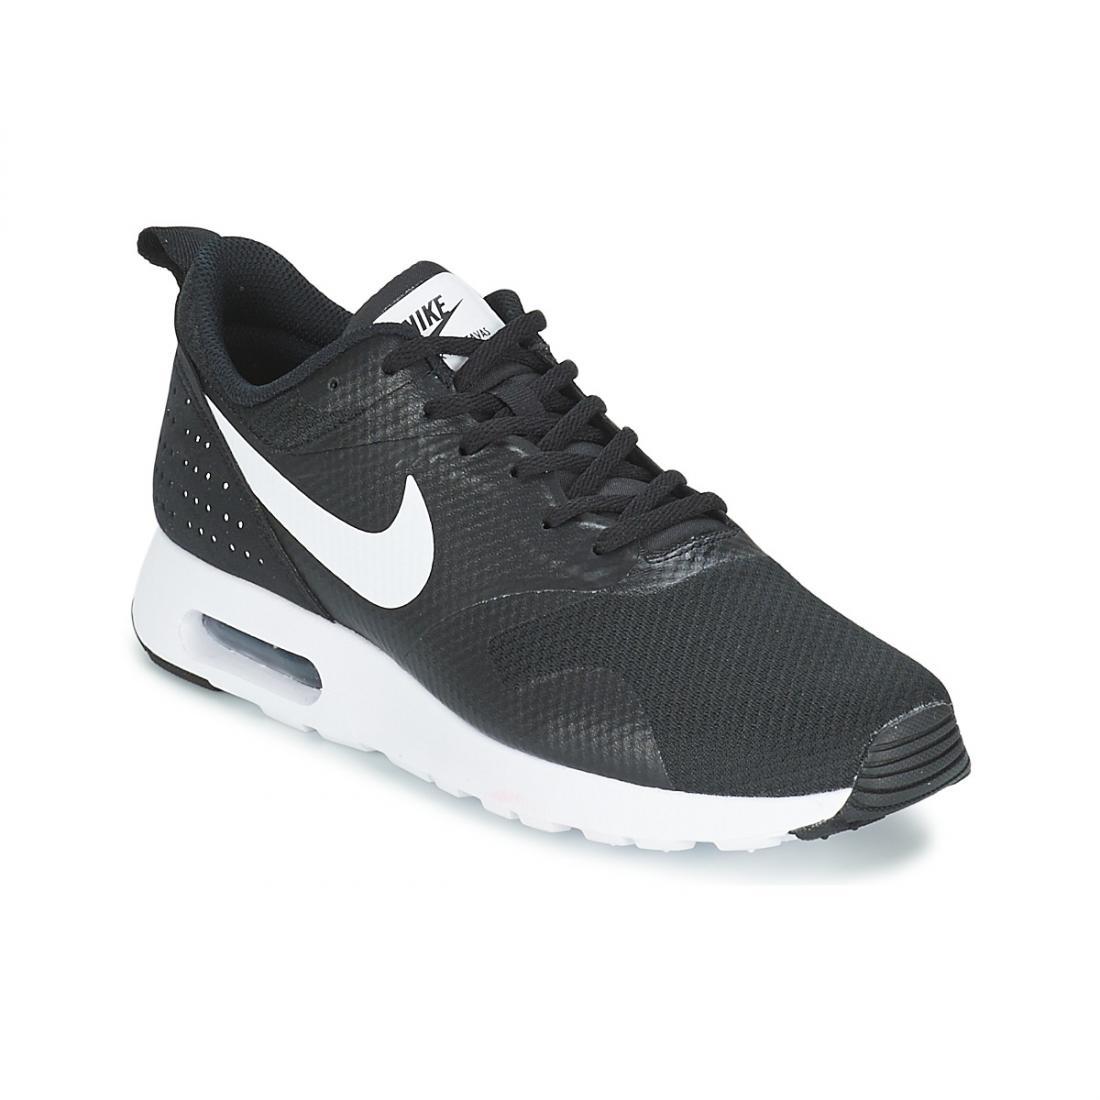 Nike Air Max Tavas PRM blanche Chaussures Baskets homme